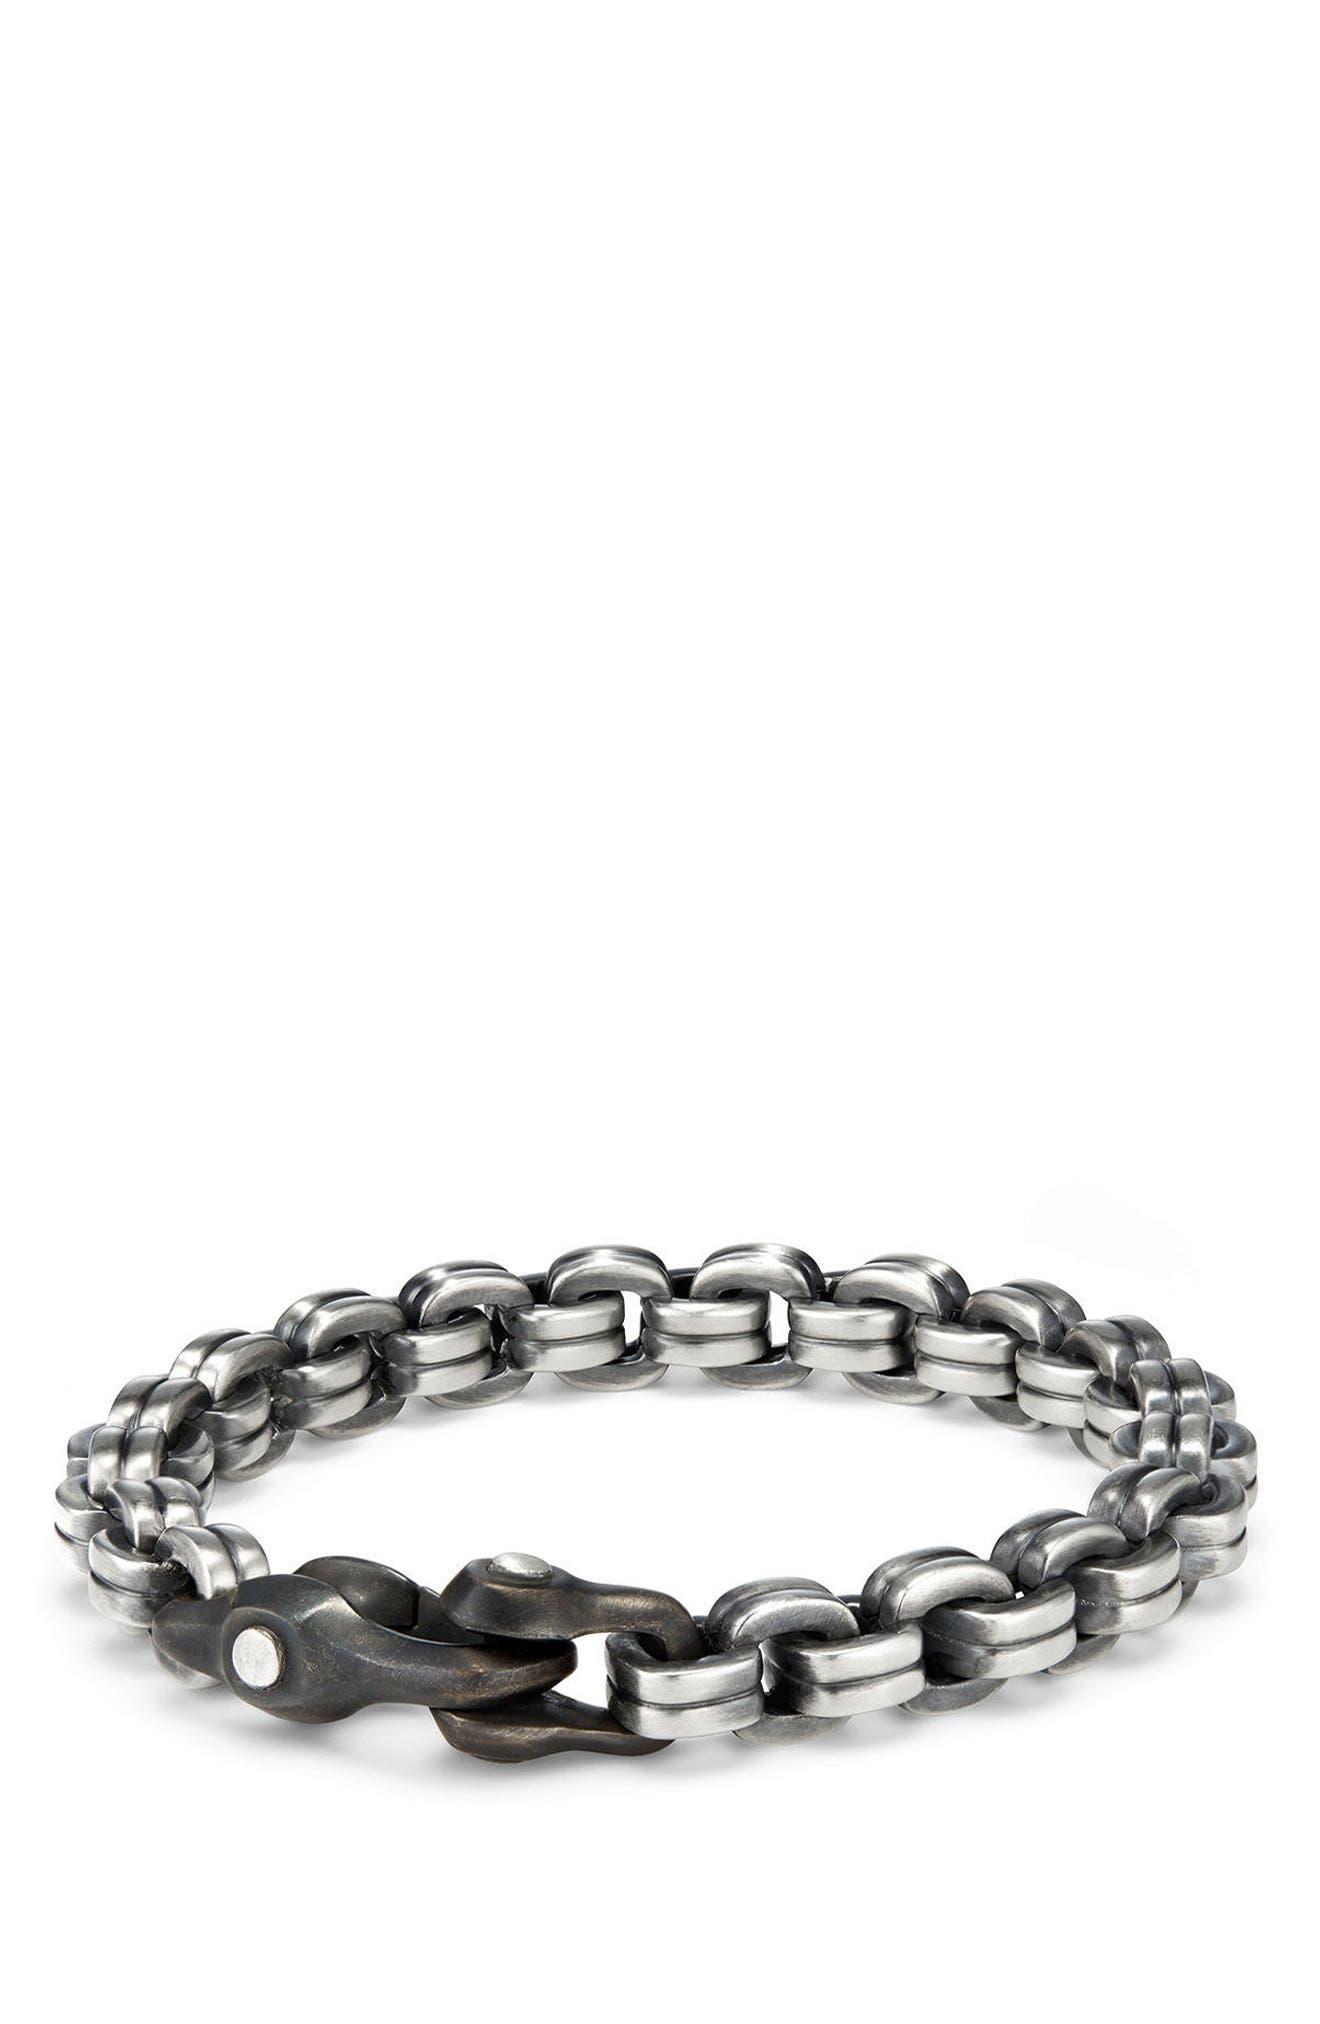 DAVID YURMAN Anvil Chain Bracelet